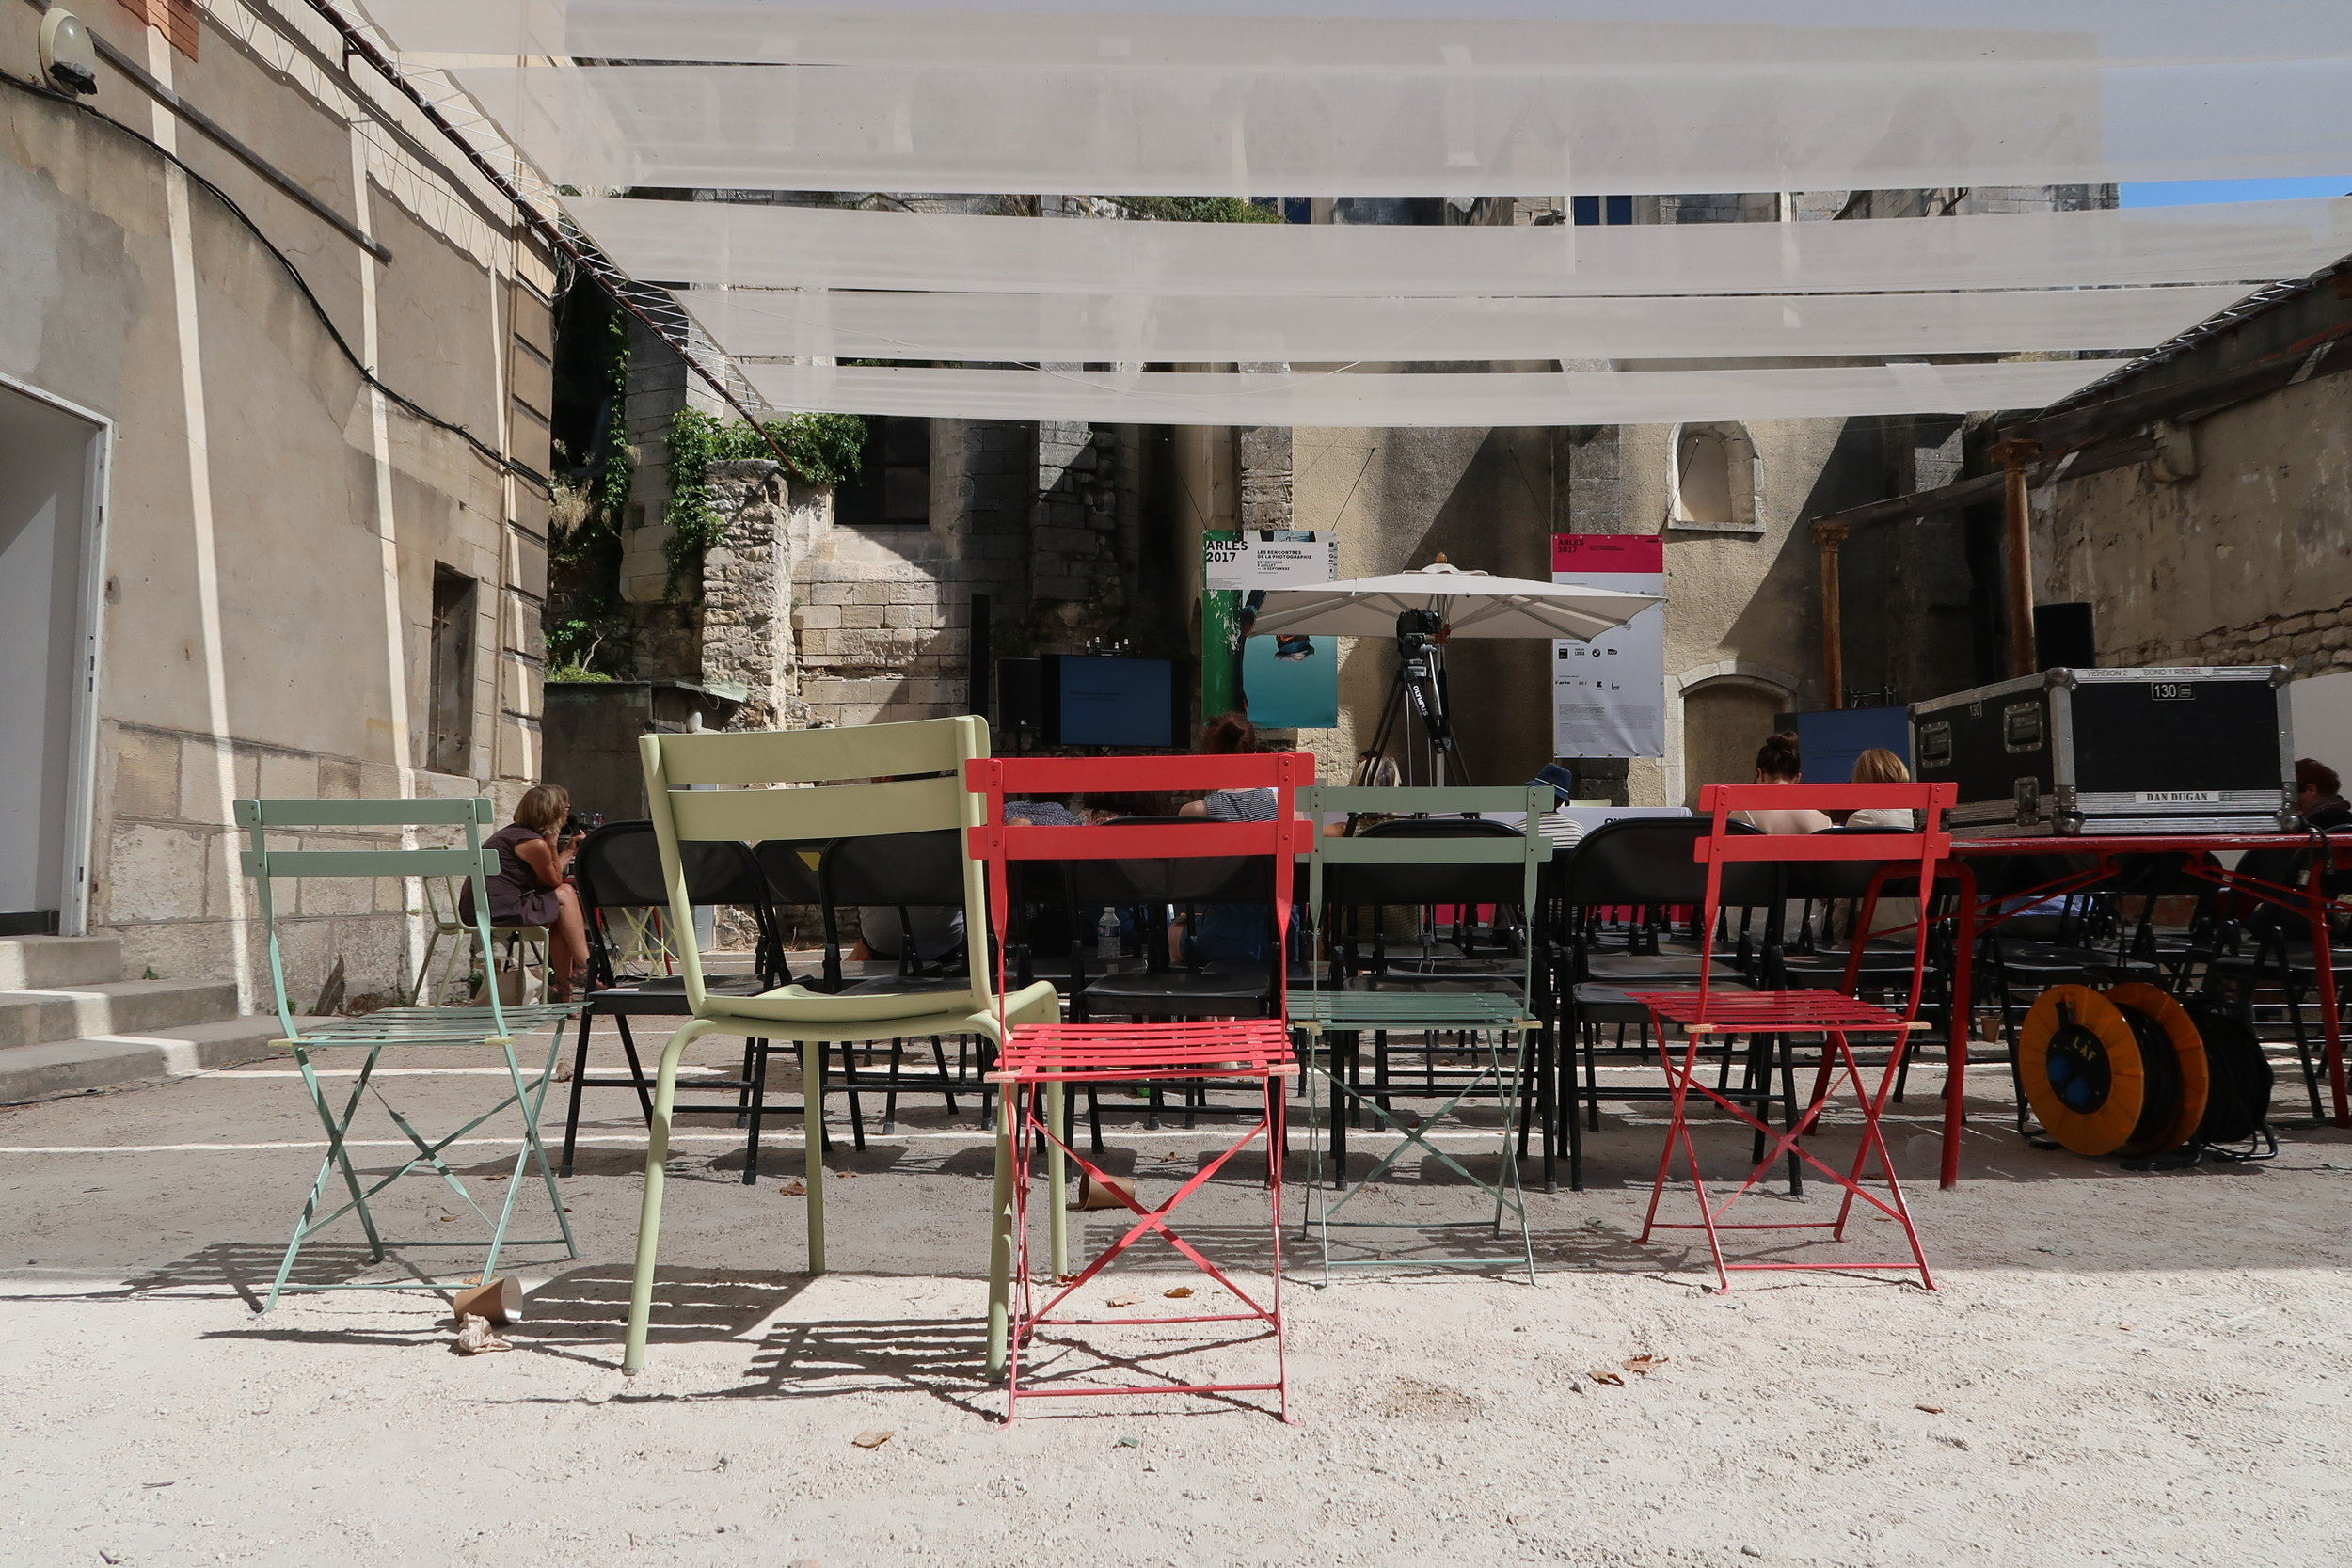 - Arles in a few words: encounters, effervescence, cultureYour highlight: Roger Ballen and Dune VarelaAnne-Gloria Lefèvre, artist